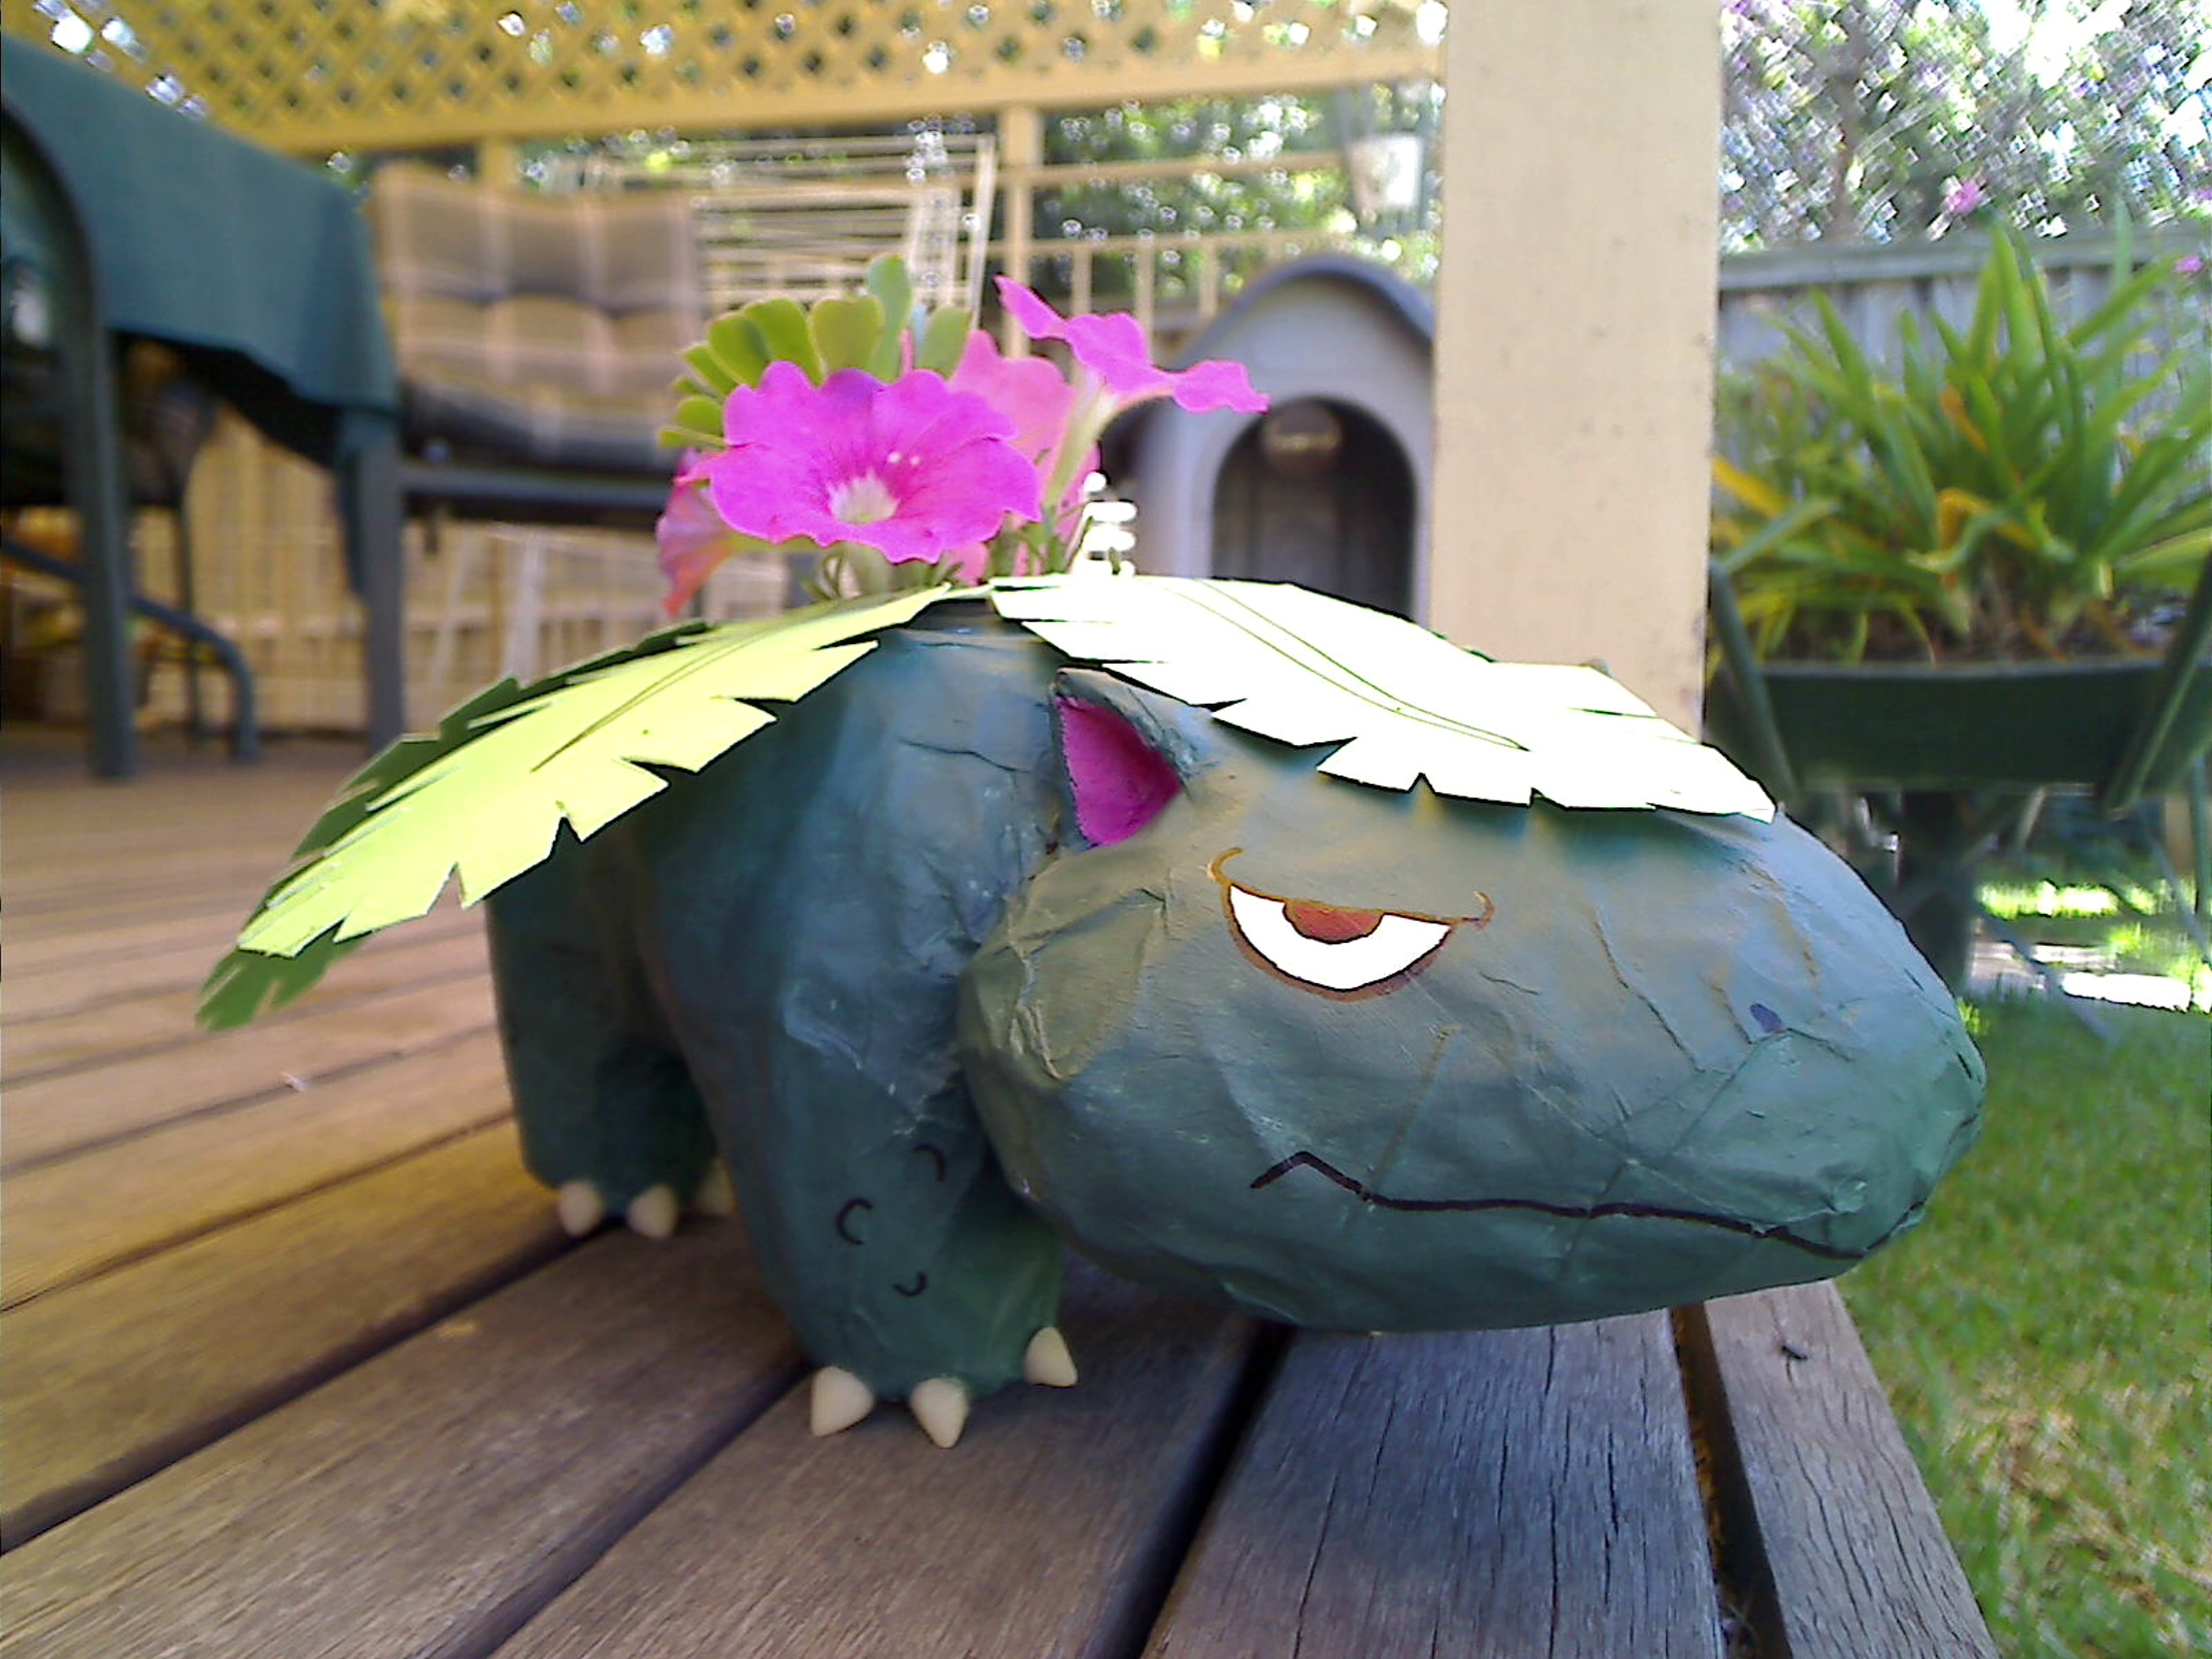 Make a Venusaur Planter Pot!